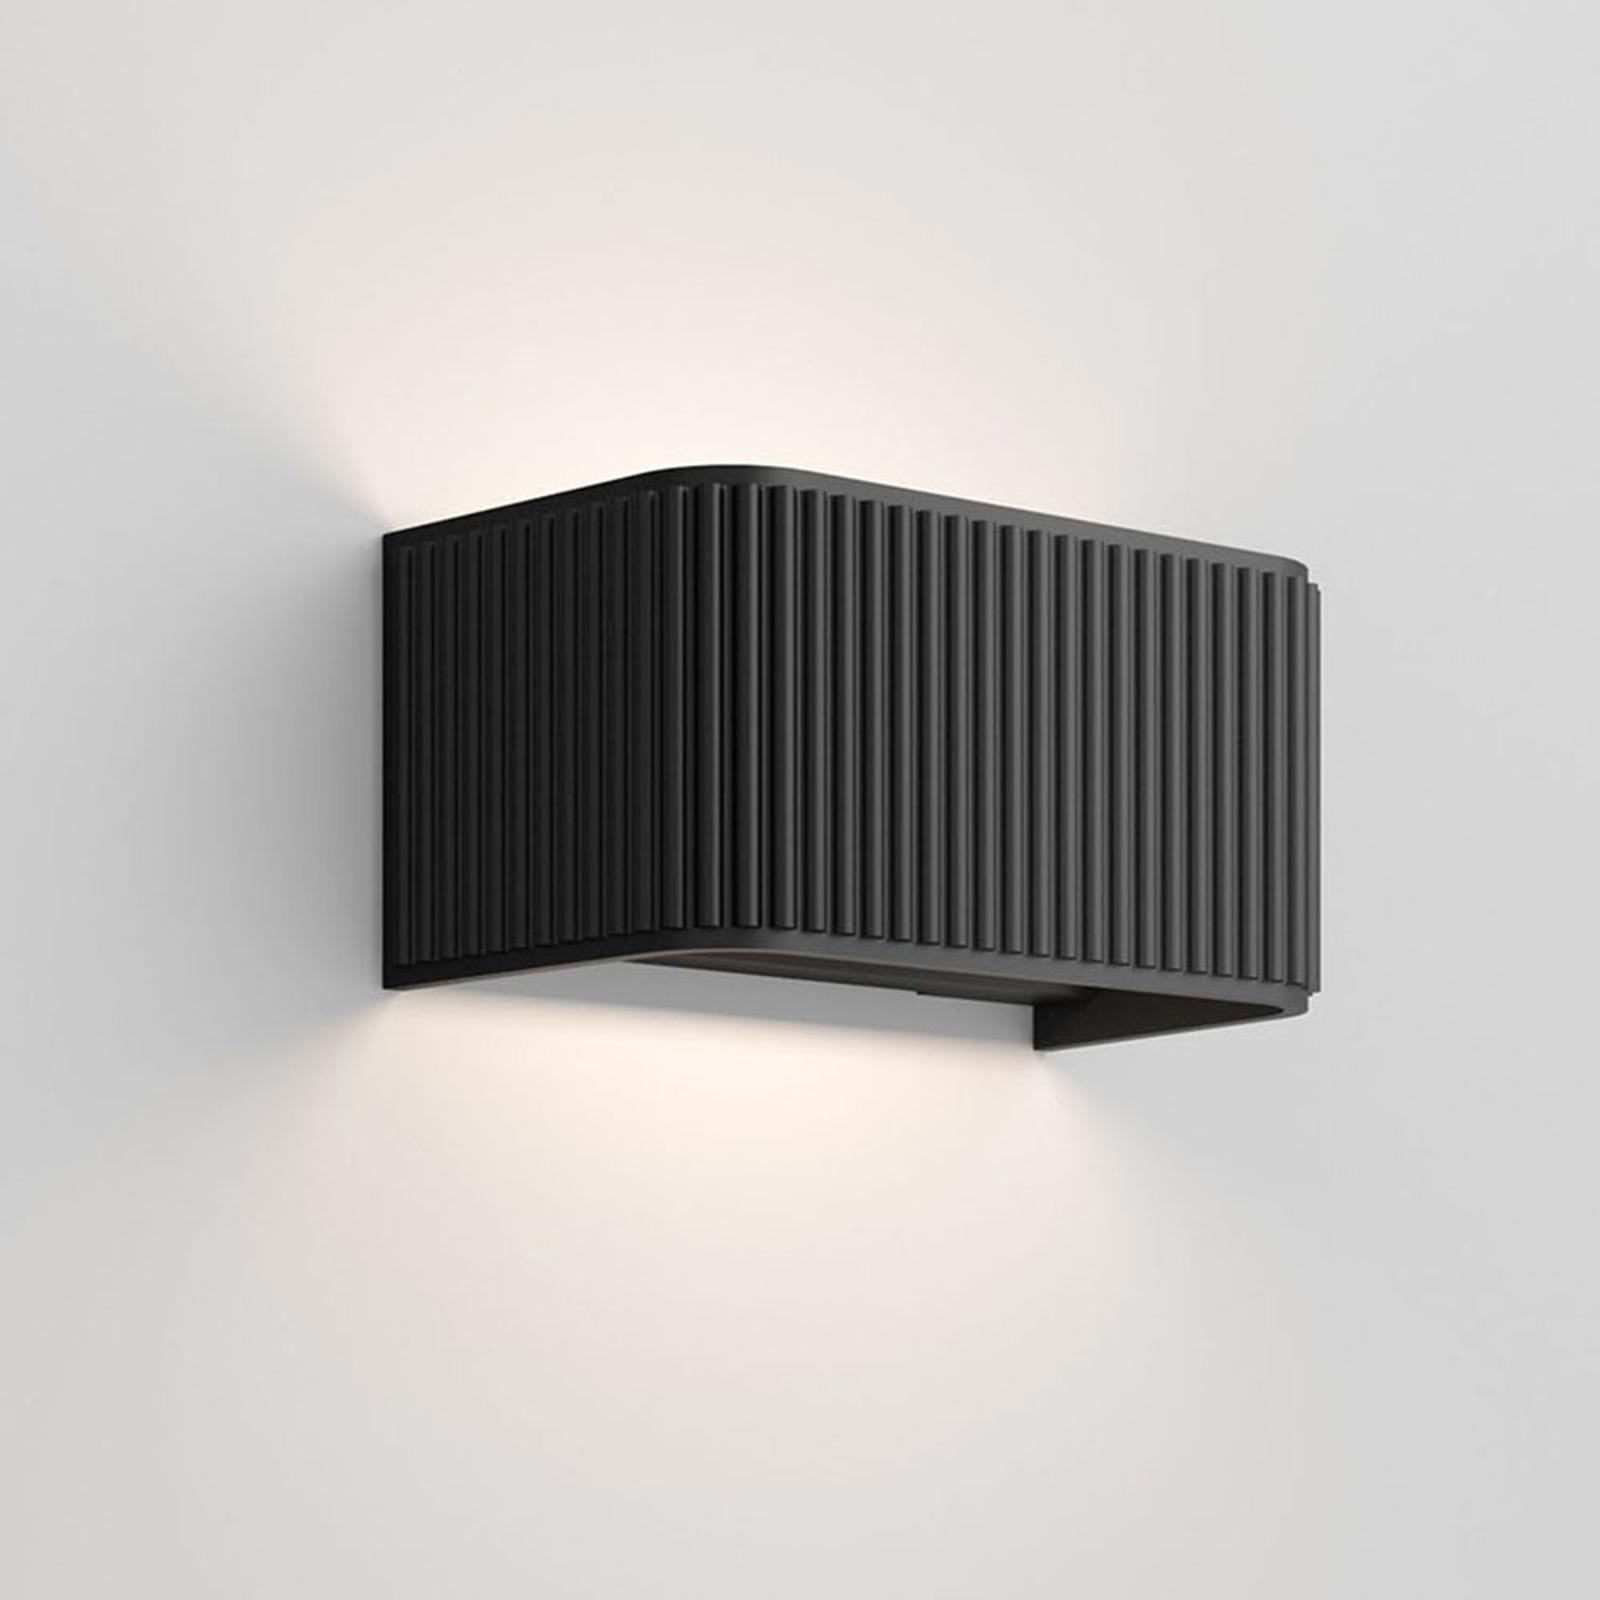 Rotaliana Dresscode W1 applique LED nera 2.700K